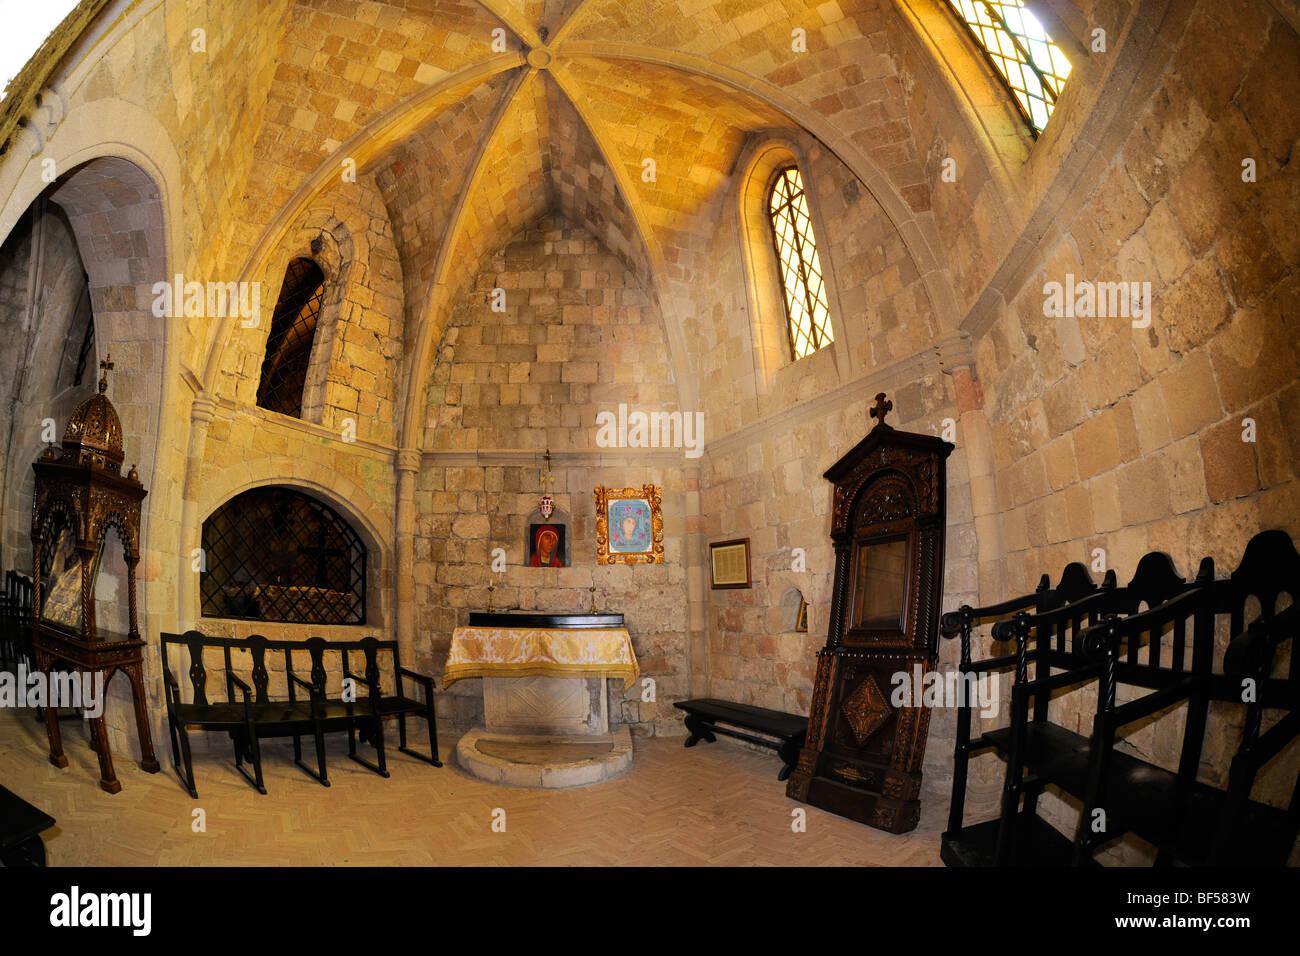 Knight's Church, reconstruction by Italians, Filérimos, Rhodes, Greece, Europe - Stock Image